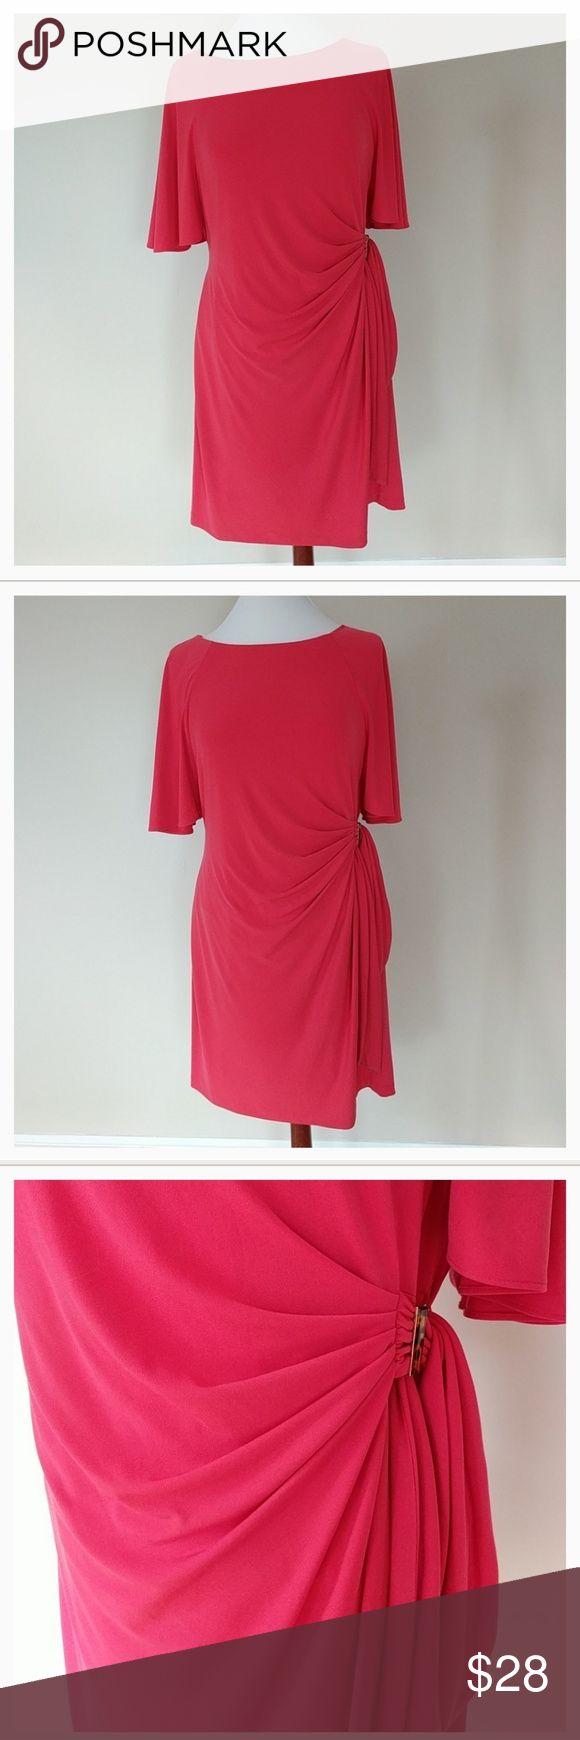 TAHARI Arthur S. lavine dress NWOT💥1 DAY SALE💥 Coral, gathered at side, petite 14, NWOT Tahari Dresses Midi